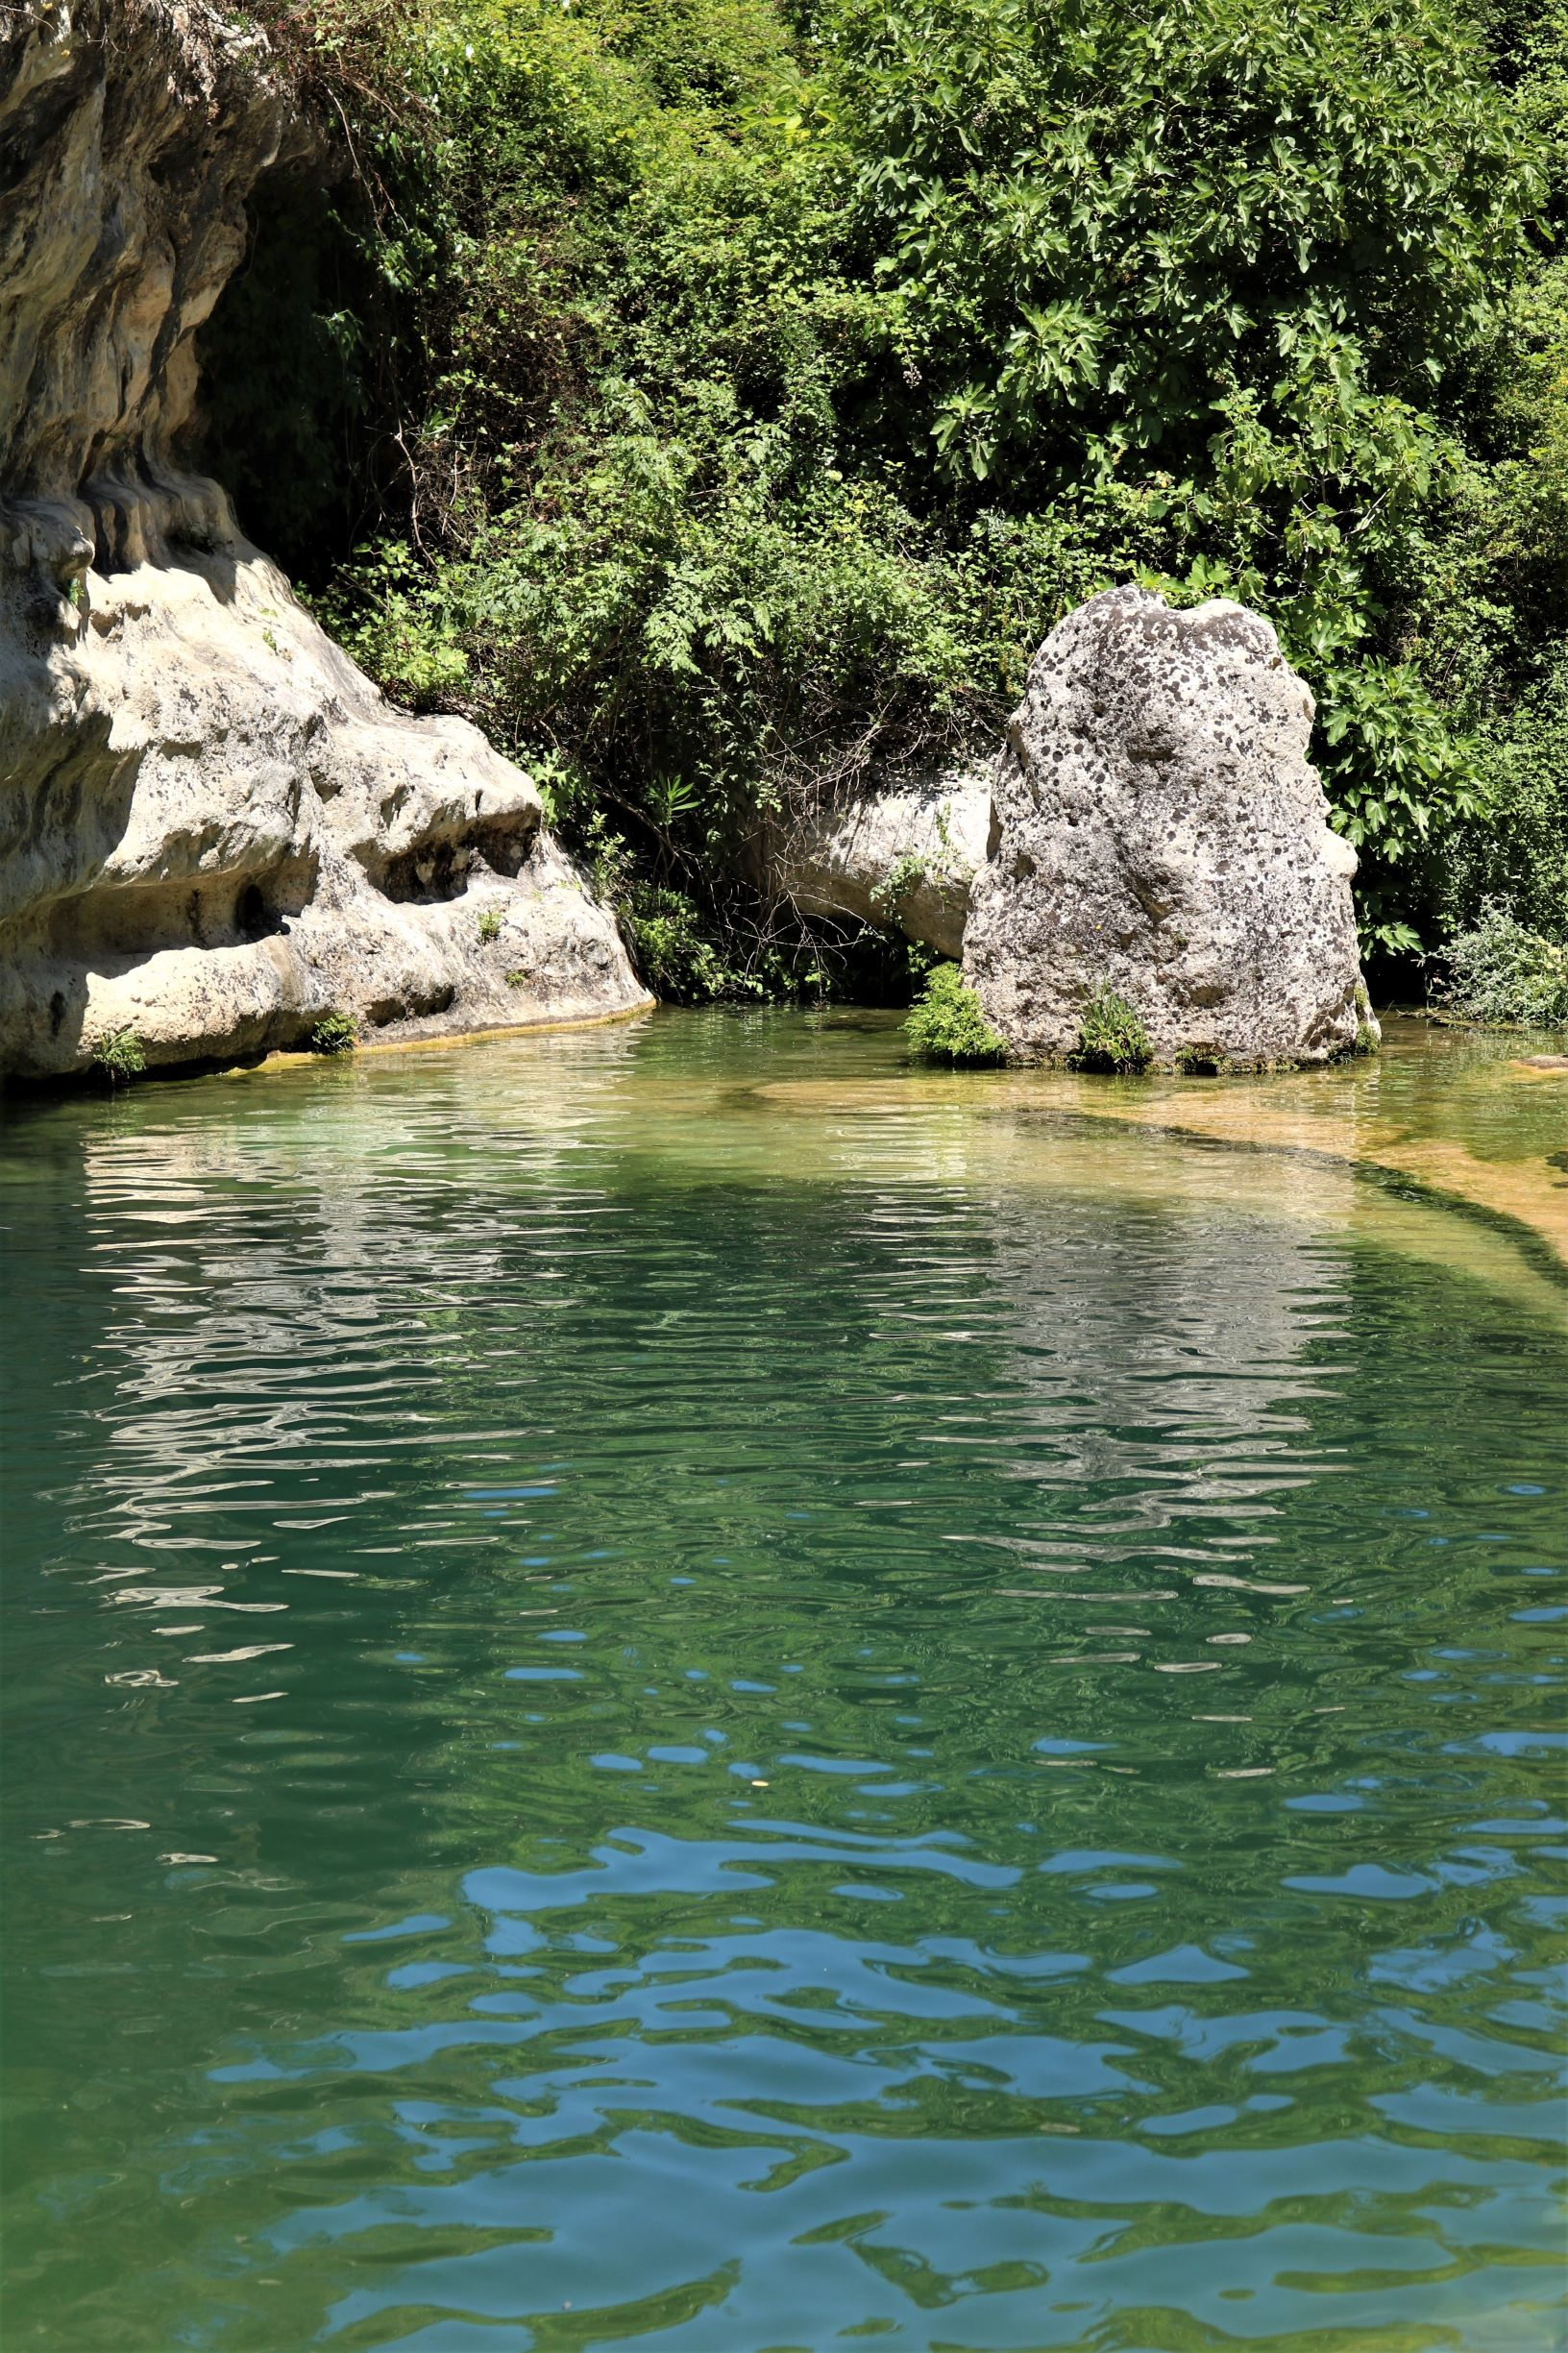 fiumi, valli iblee, iblei, cava grande del cassibile, escursionismo, trekking, sicilia